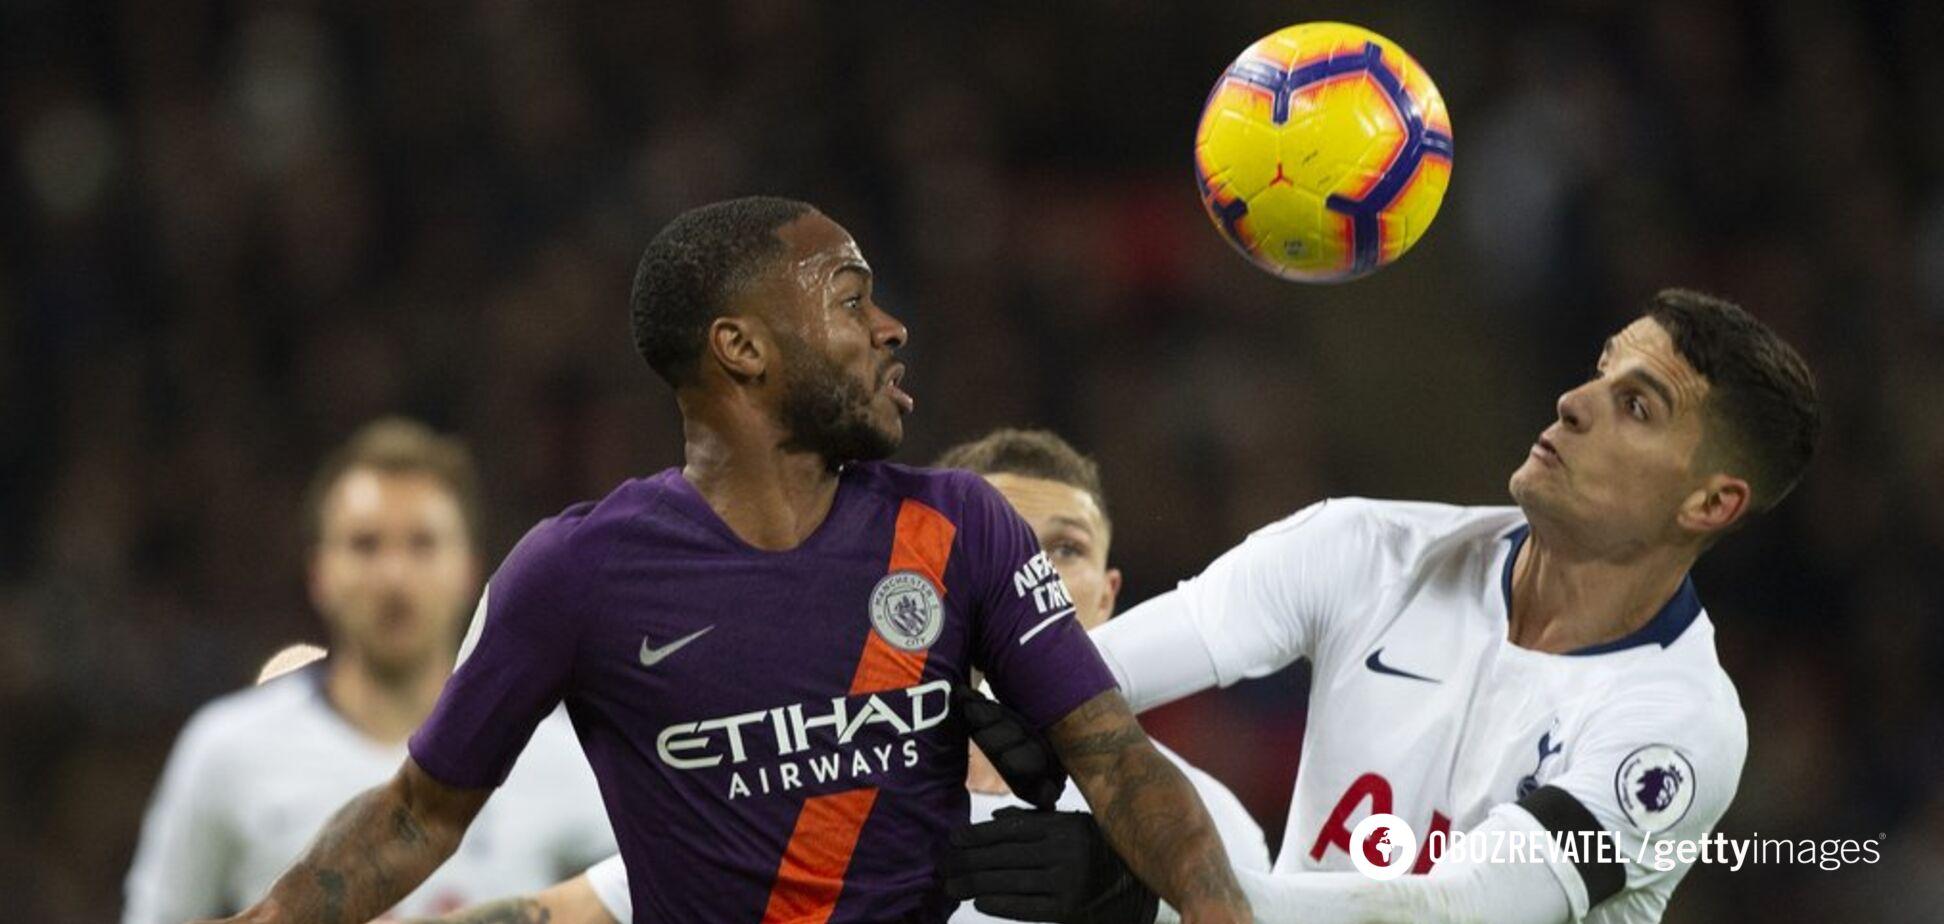 Эдерсон не выручил! Тоттенхэм — Манчестер Сити — 1-0: онлайн-трансляция 1/4 финала Лиги чемпионов